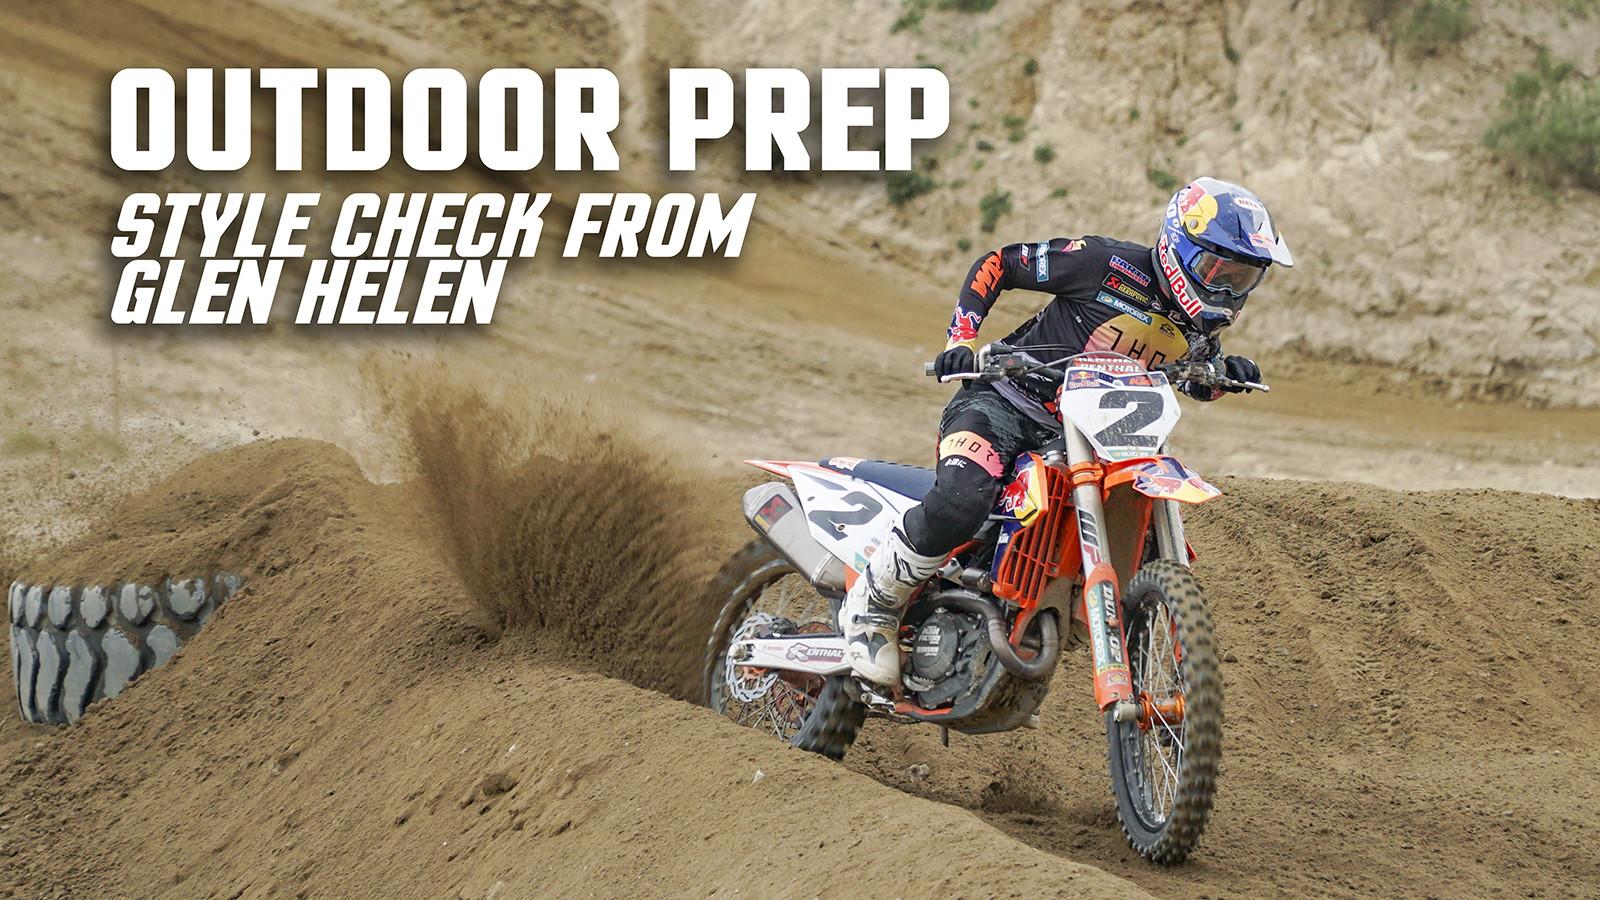 Outdoor Prep: Style Check From Glen Helen